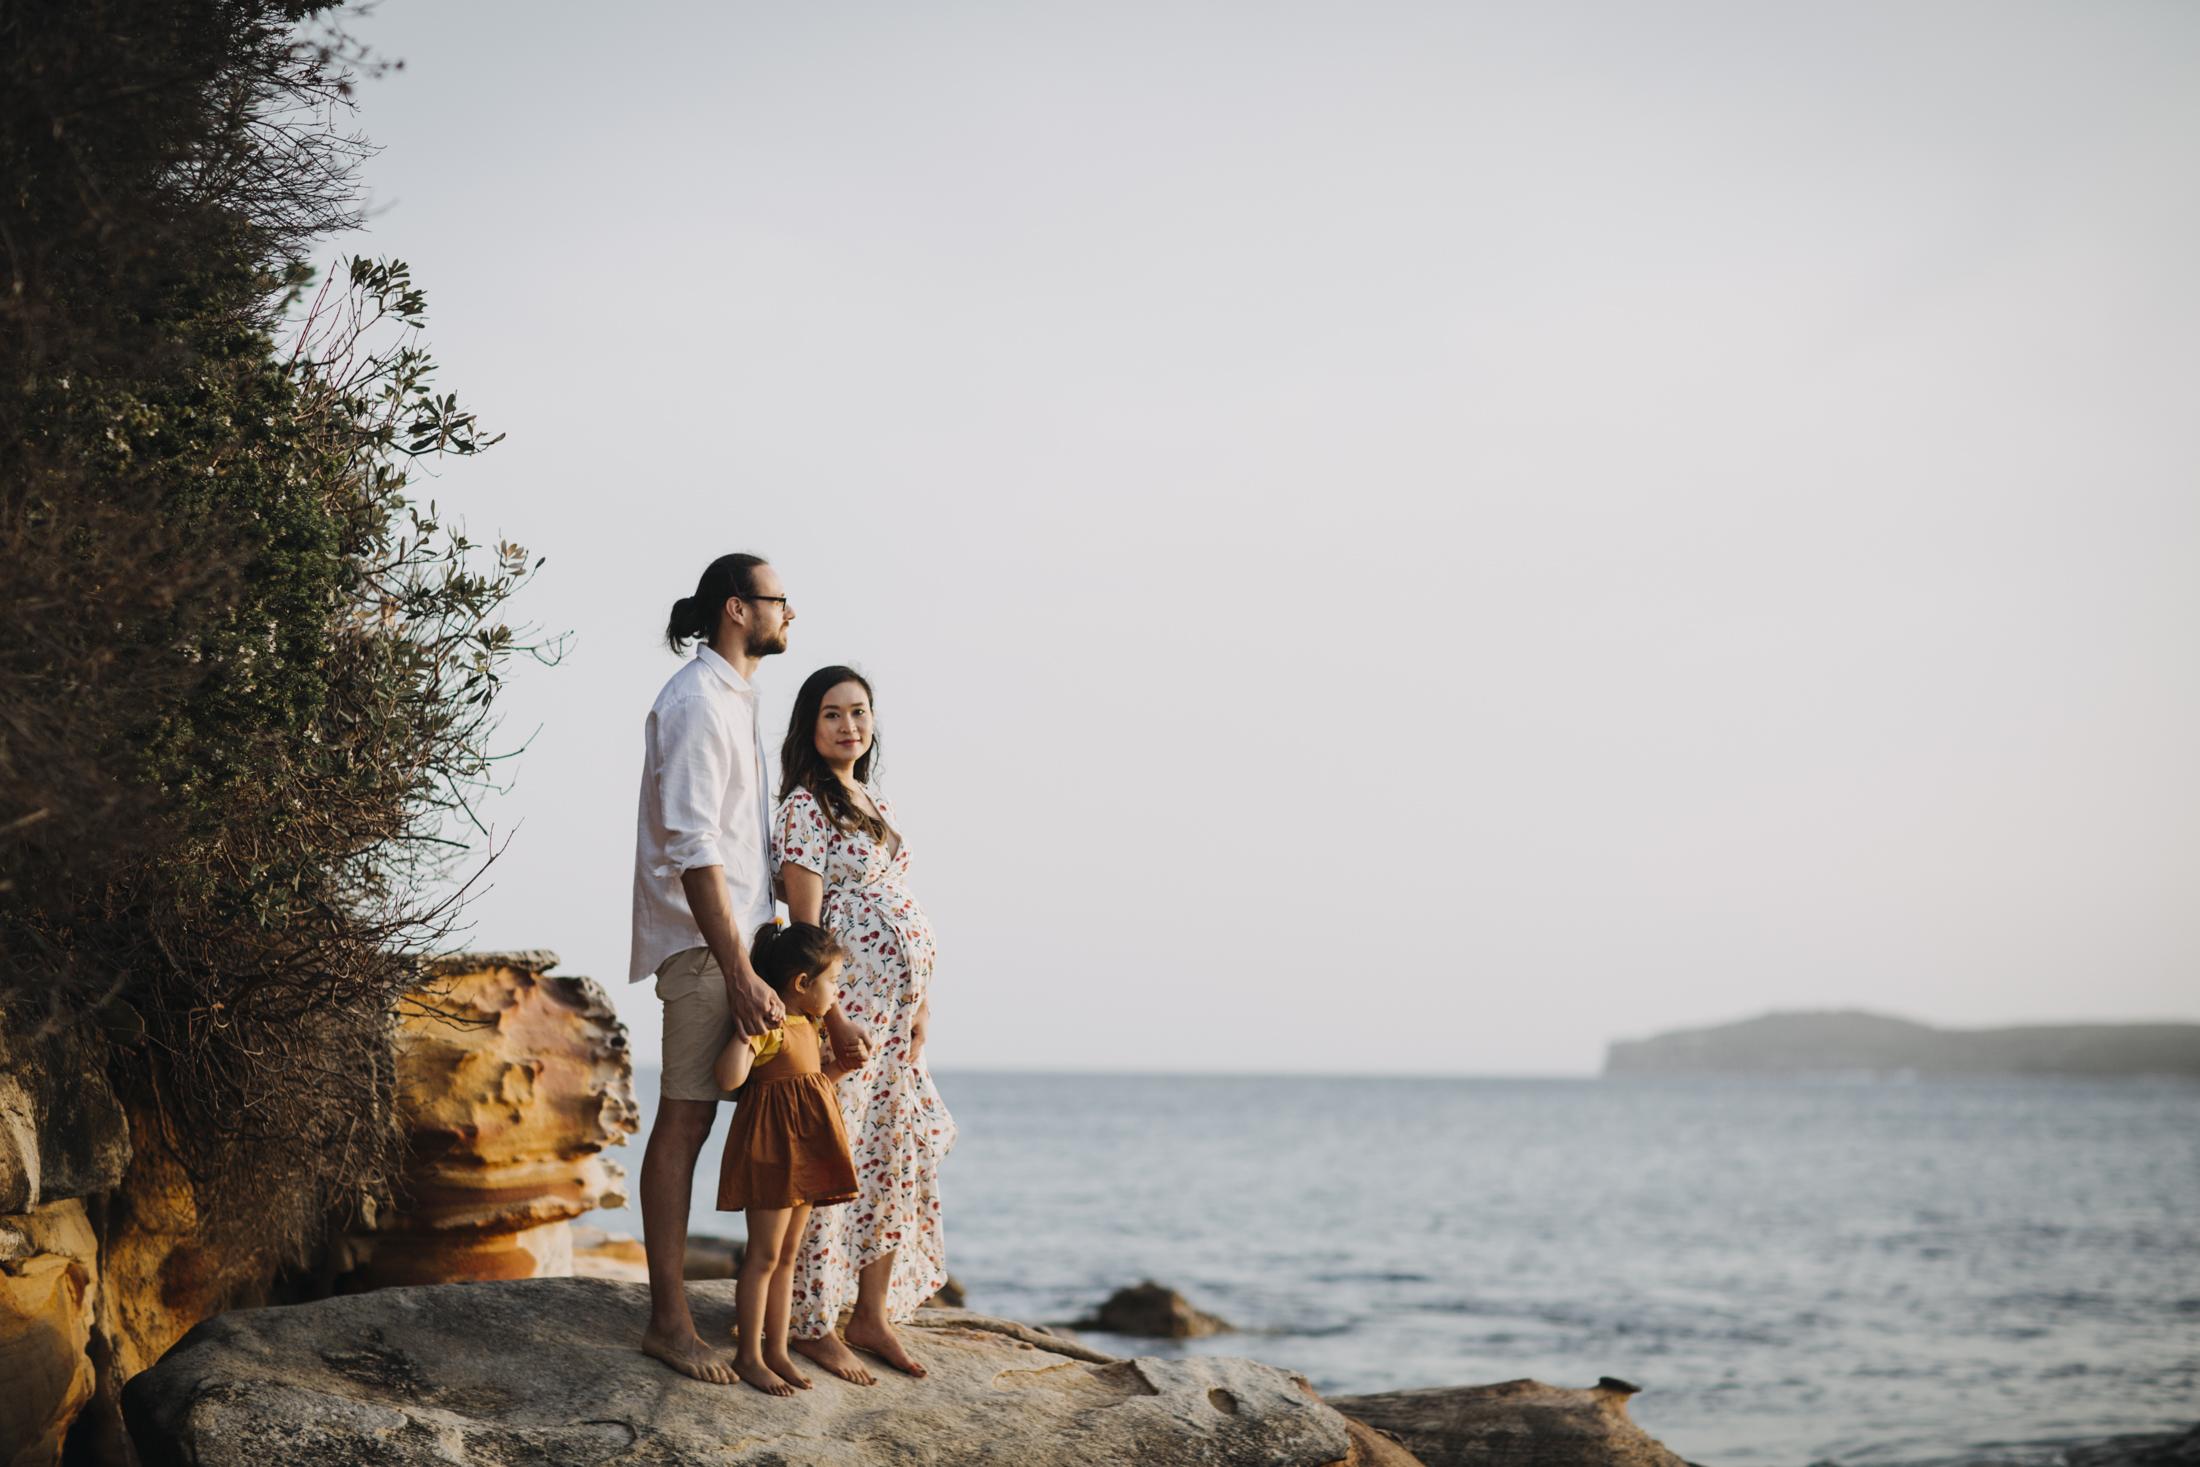 sheridan_nilsson_northern_beaches_maternity_family_photographer-7745.jpg